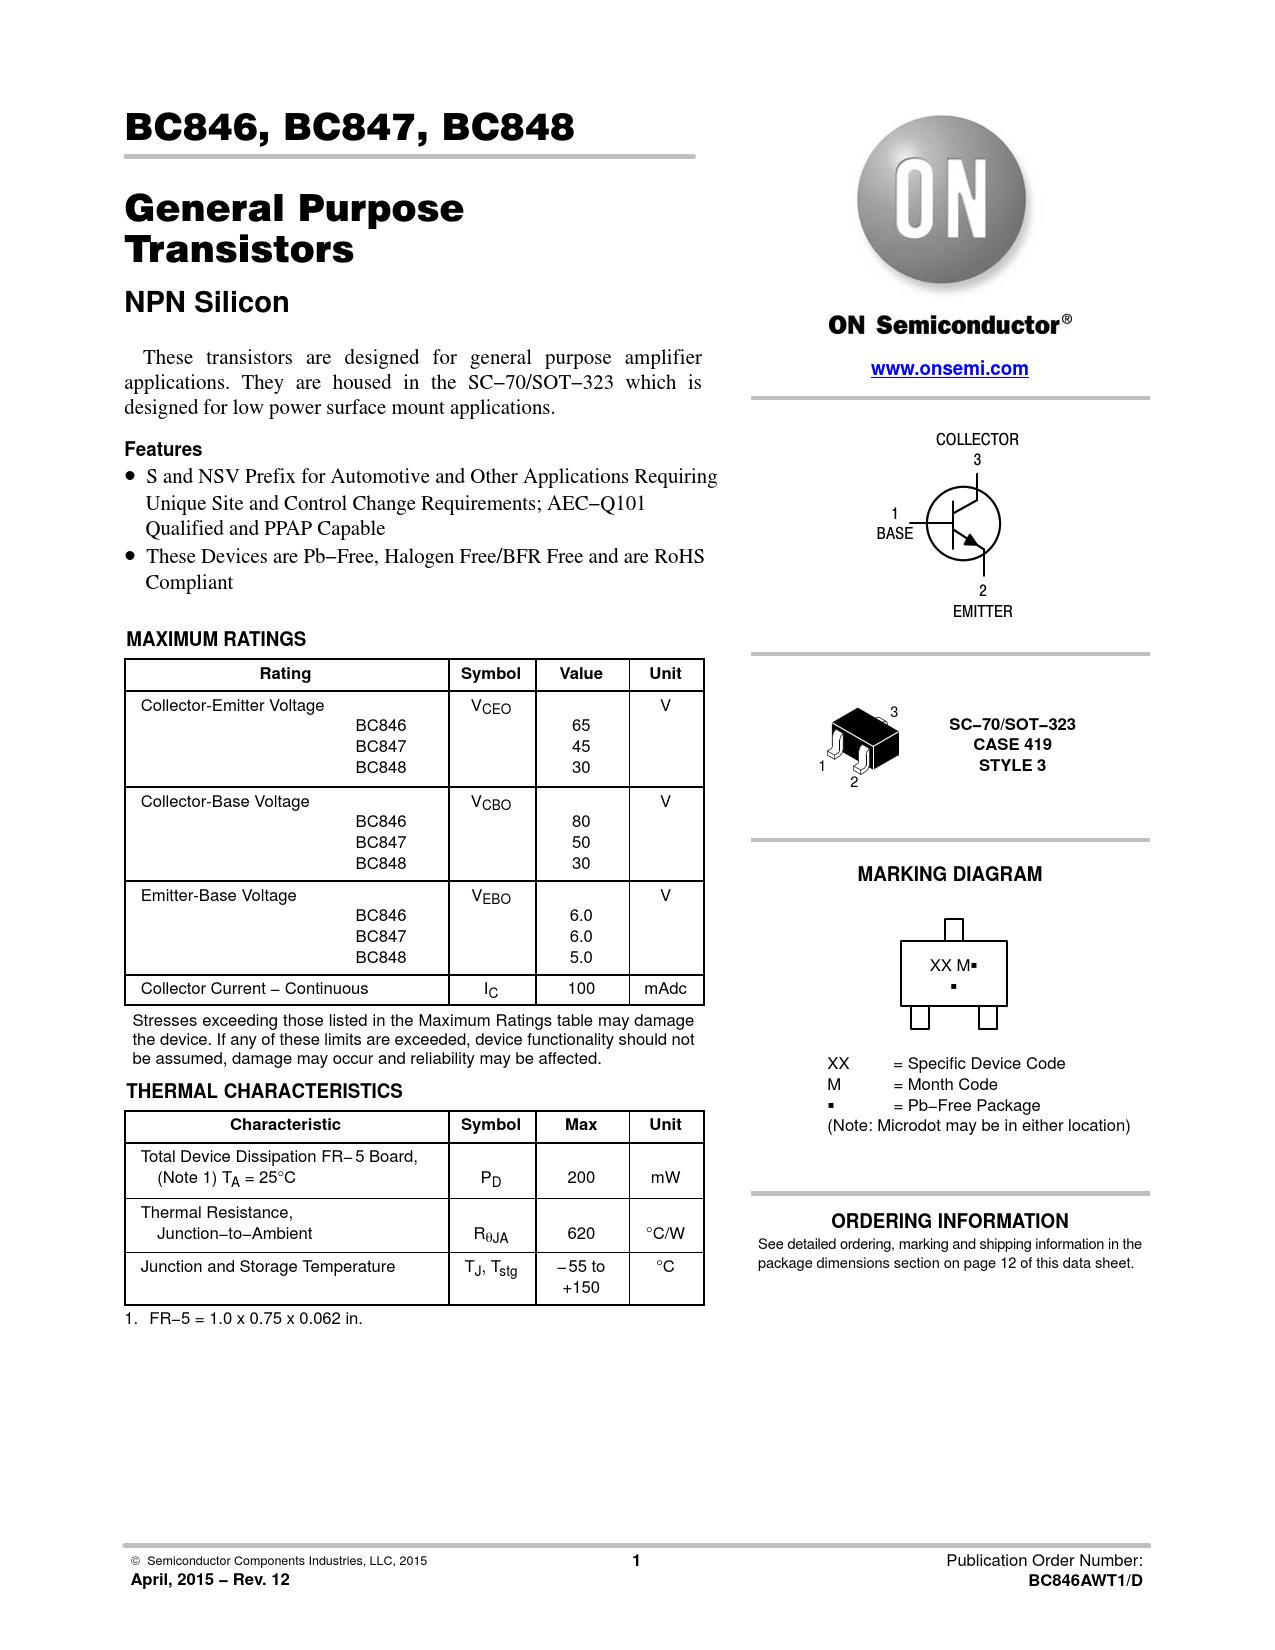 Datasheet BC846, BC847, BC848 ON Semiconductor, Версия: 12